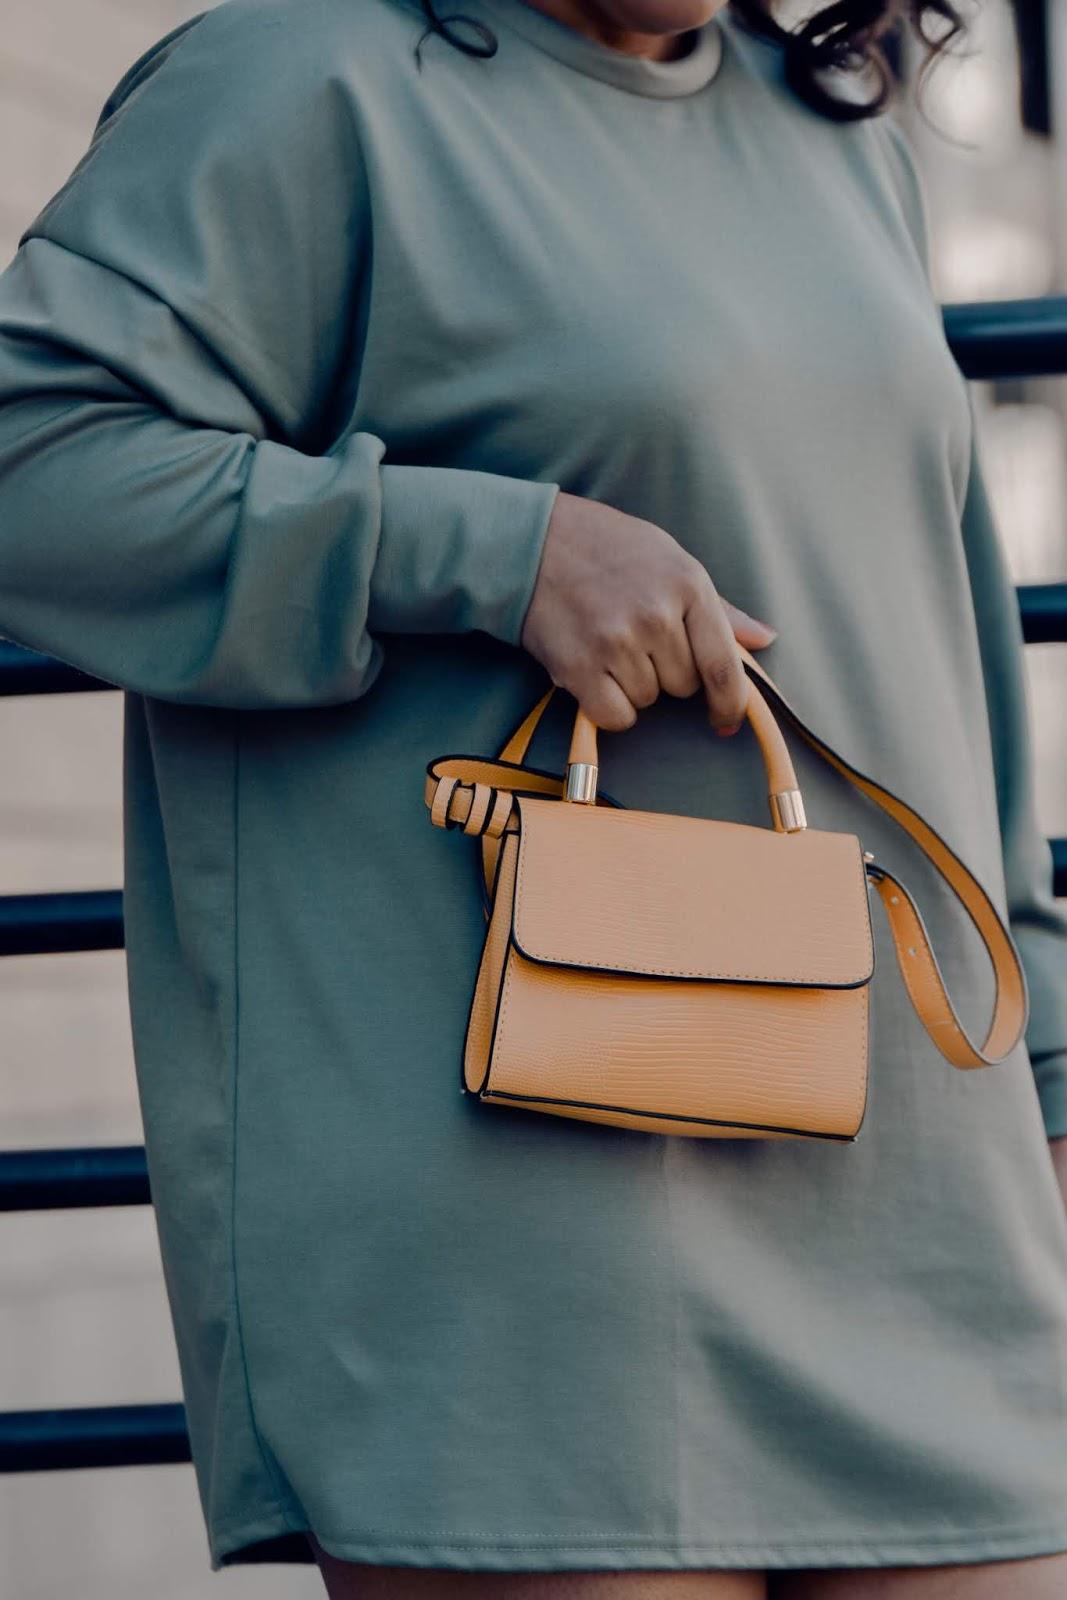 shein, shein reviews, pattys kloset, spring bags, micro bags, mini bags, small spring bags, pantone color yellow, mustard handbag